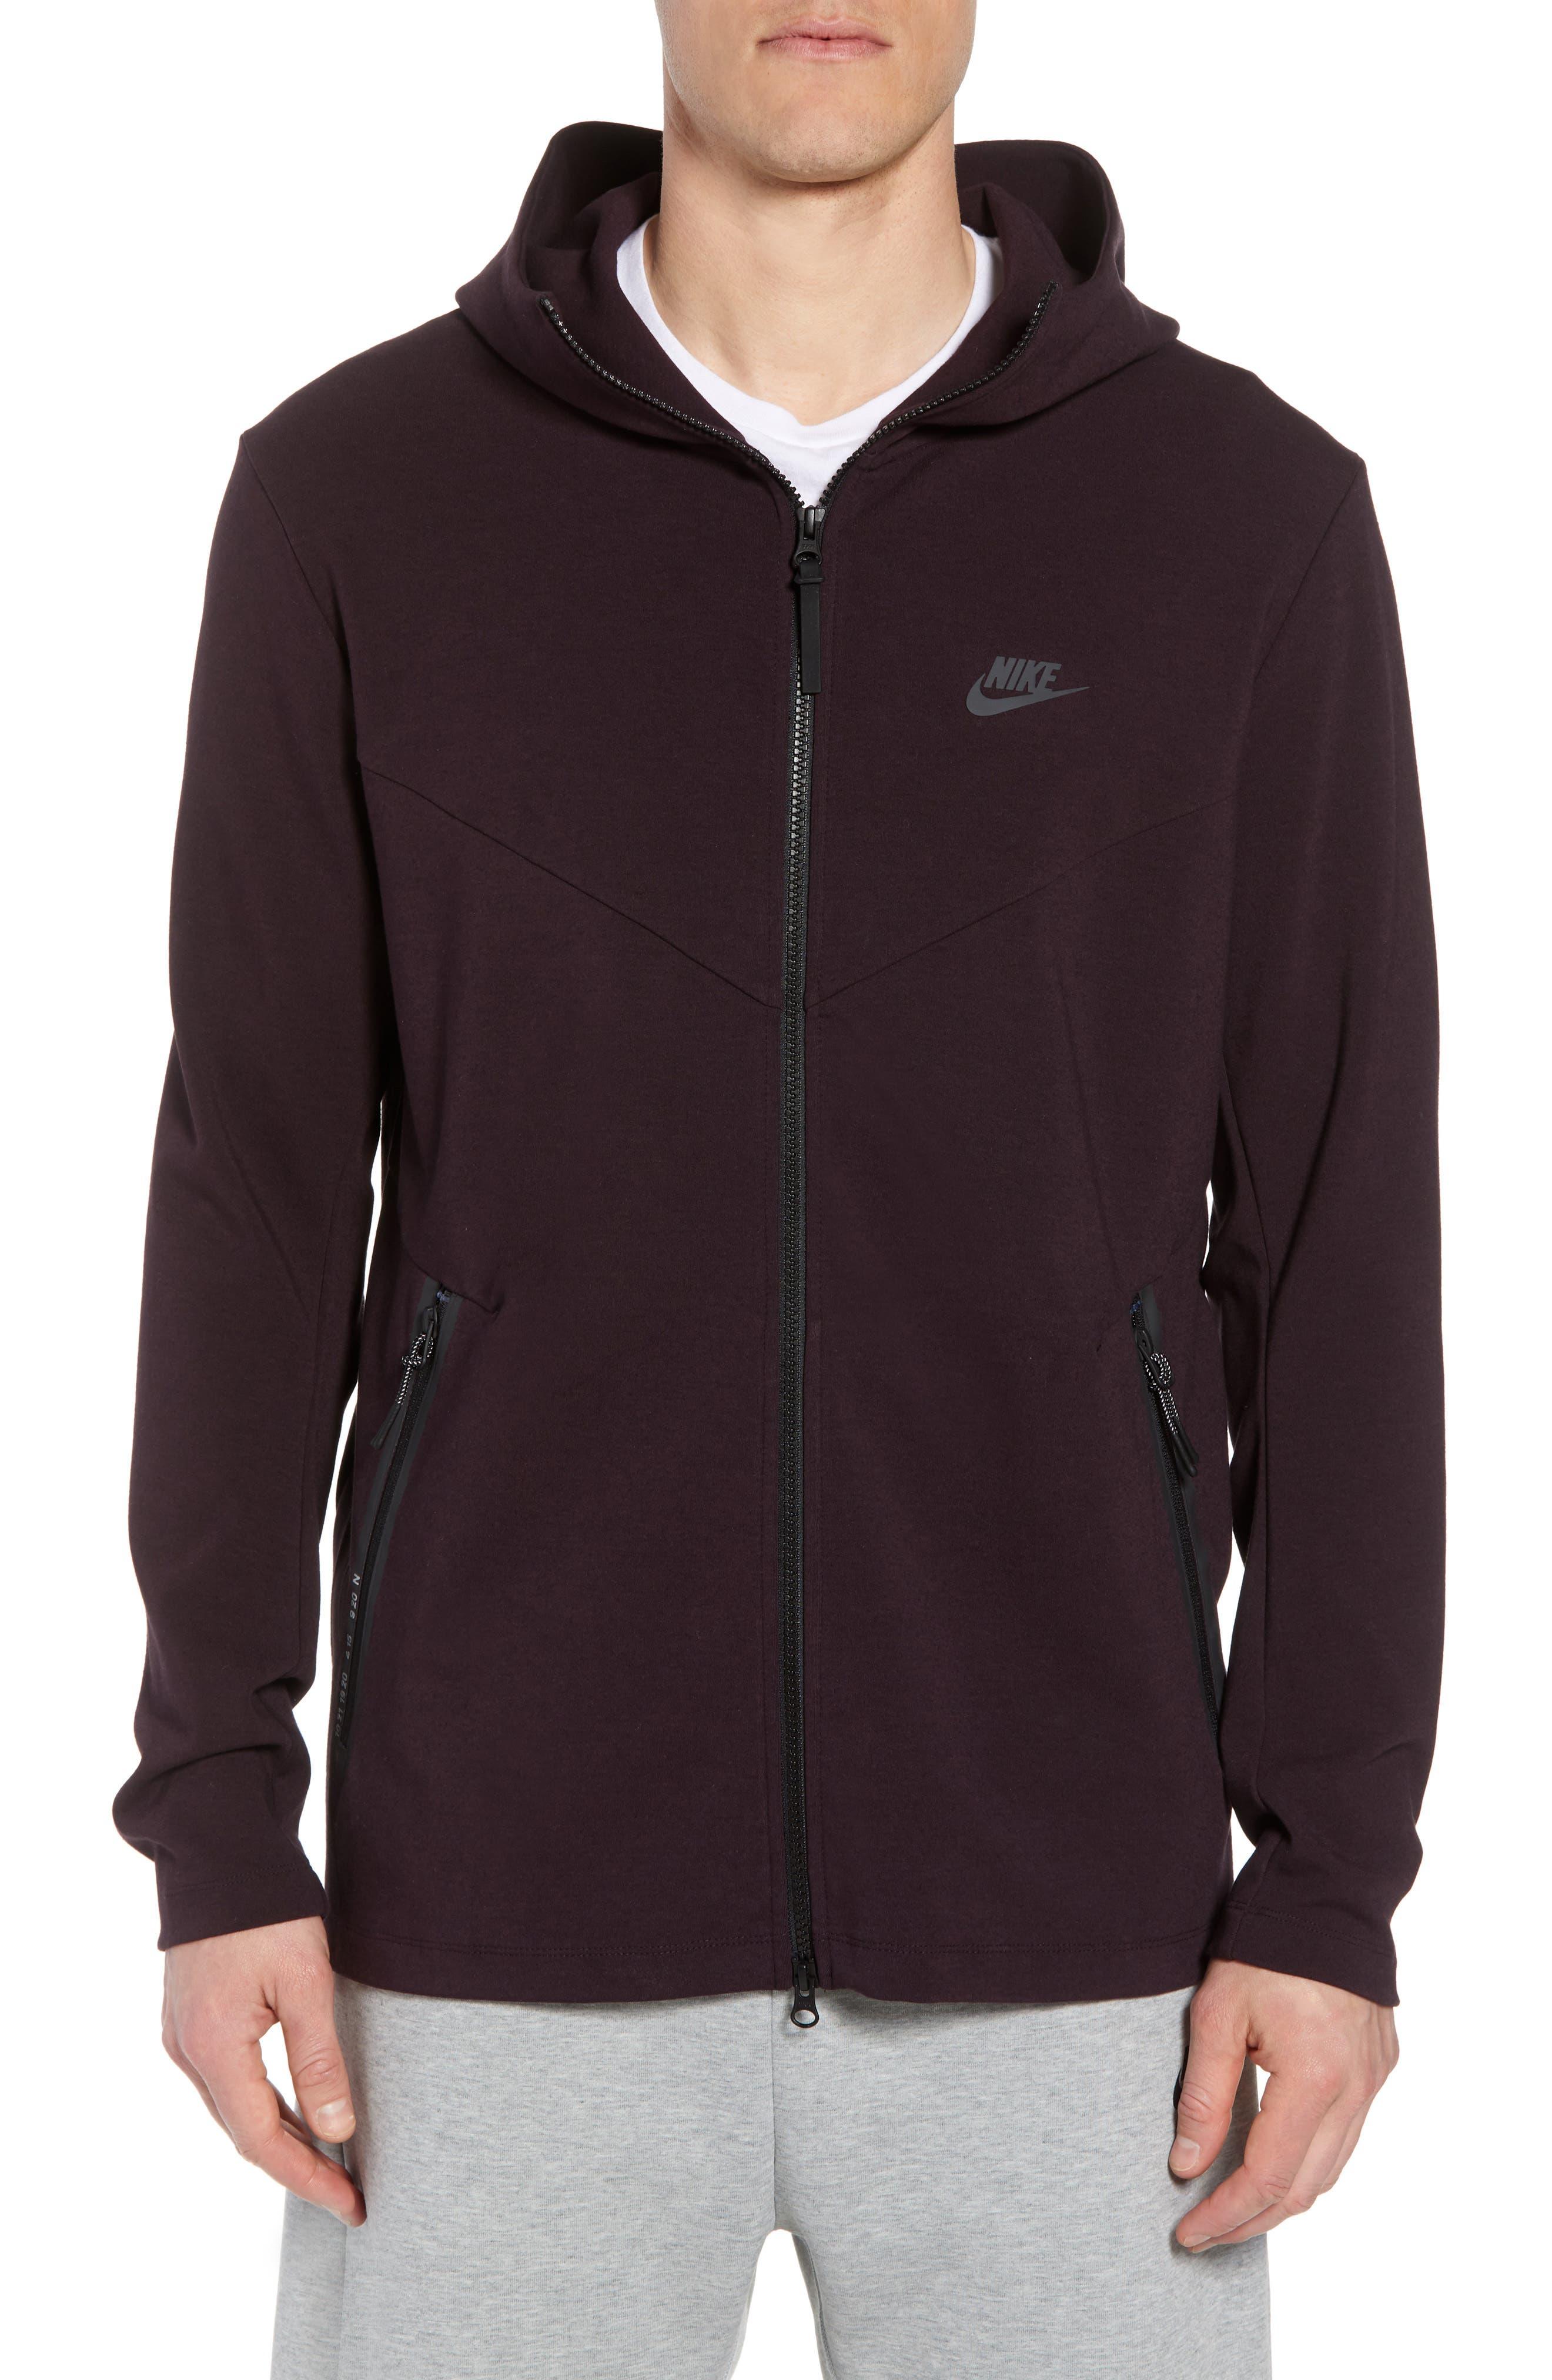 d607f4baed8e Nike Hoodies   Sweatshirts for Men